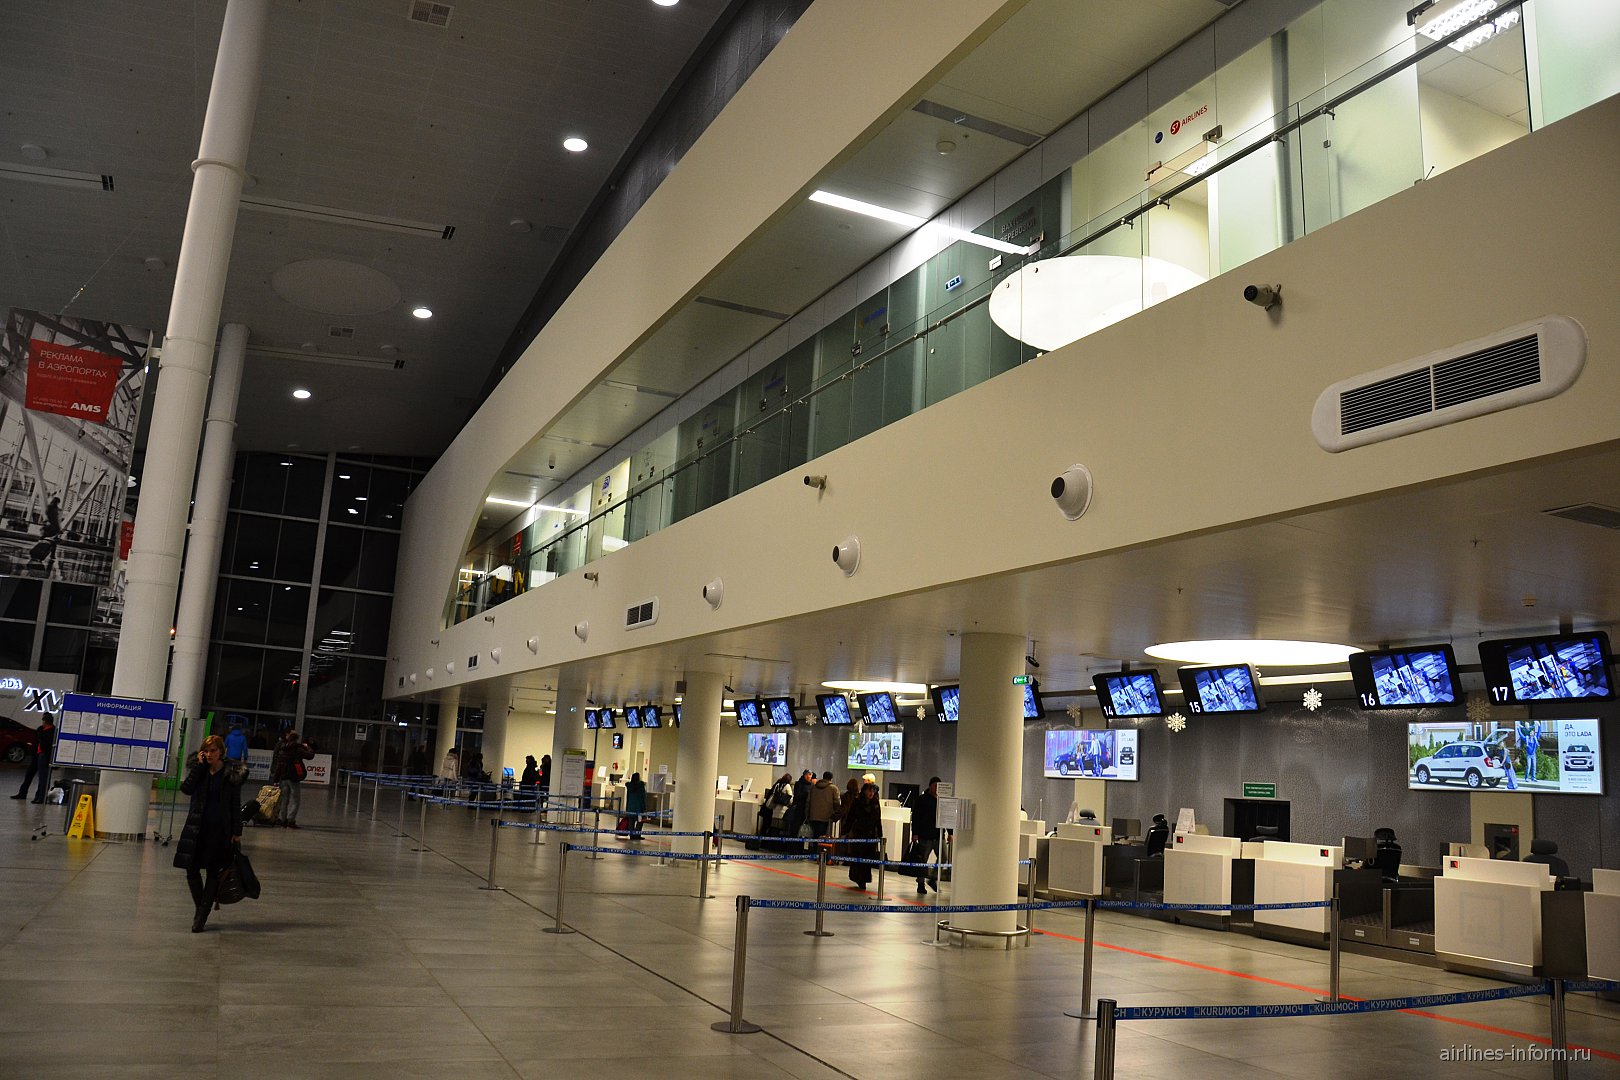 Зона регистрации в аэропорту Самара Курумоч